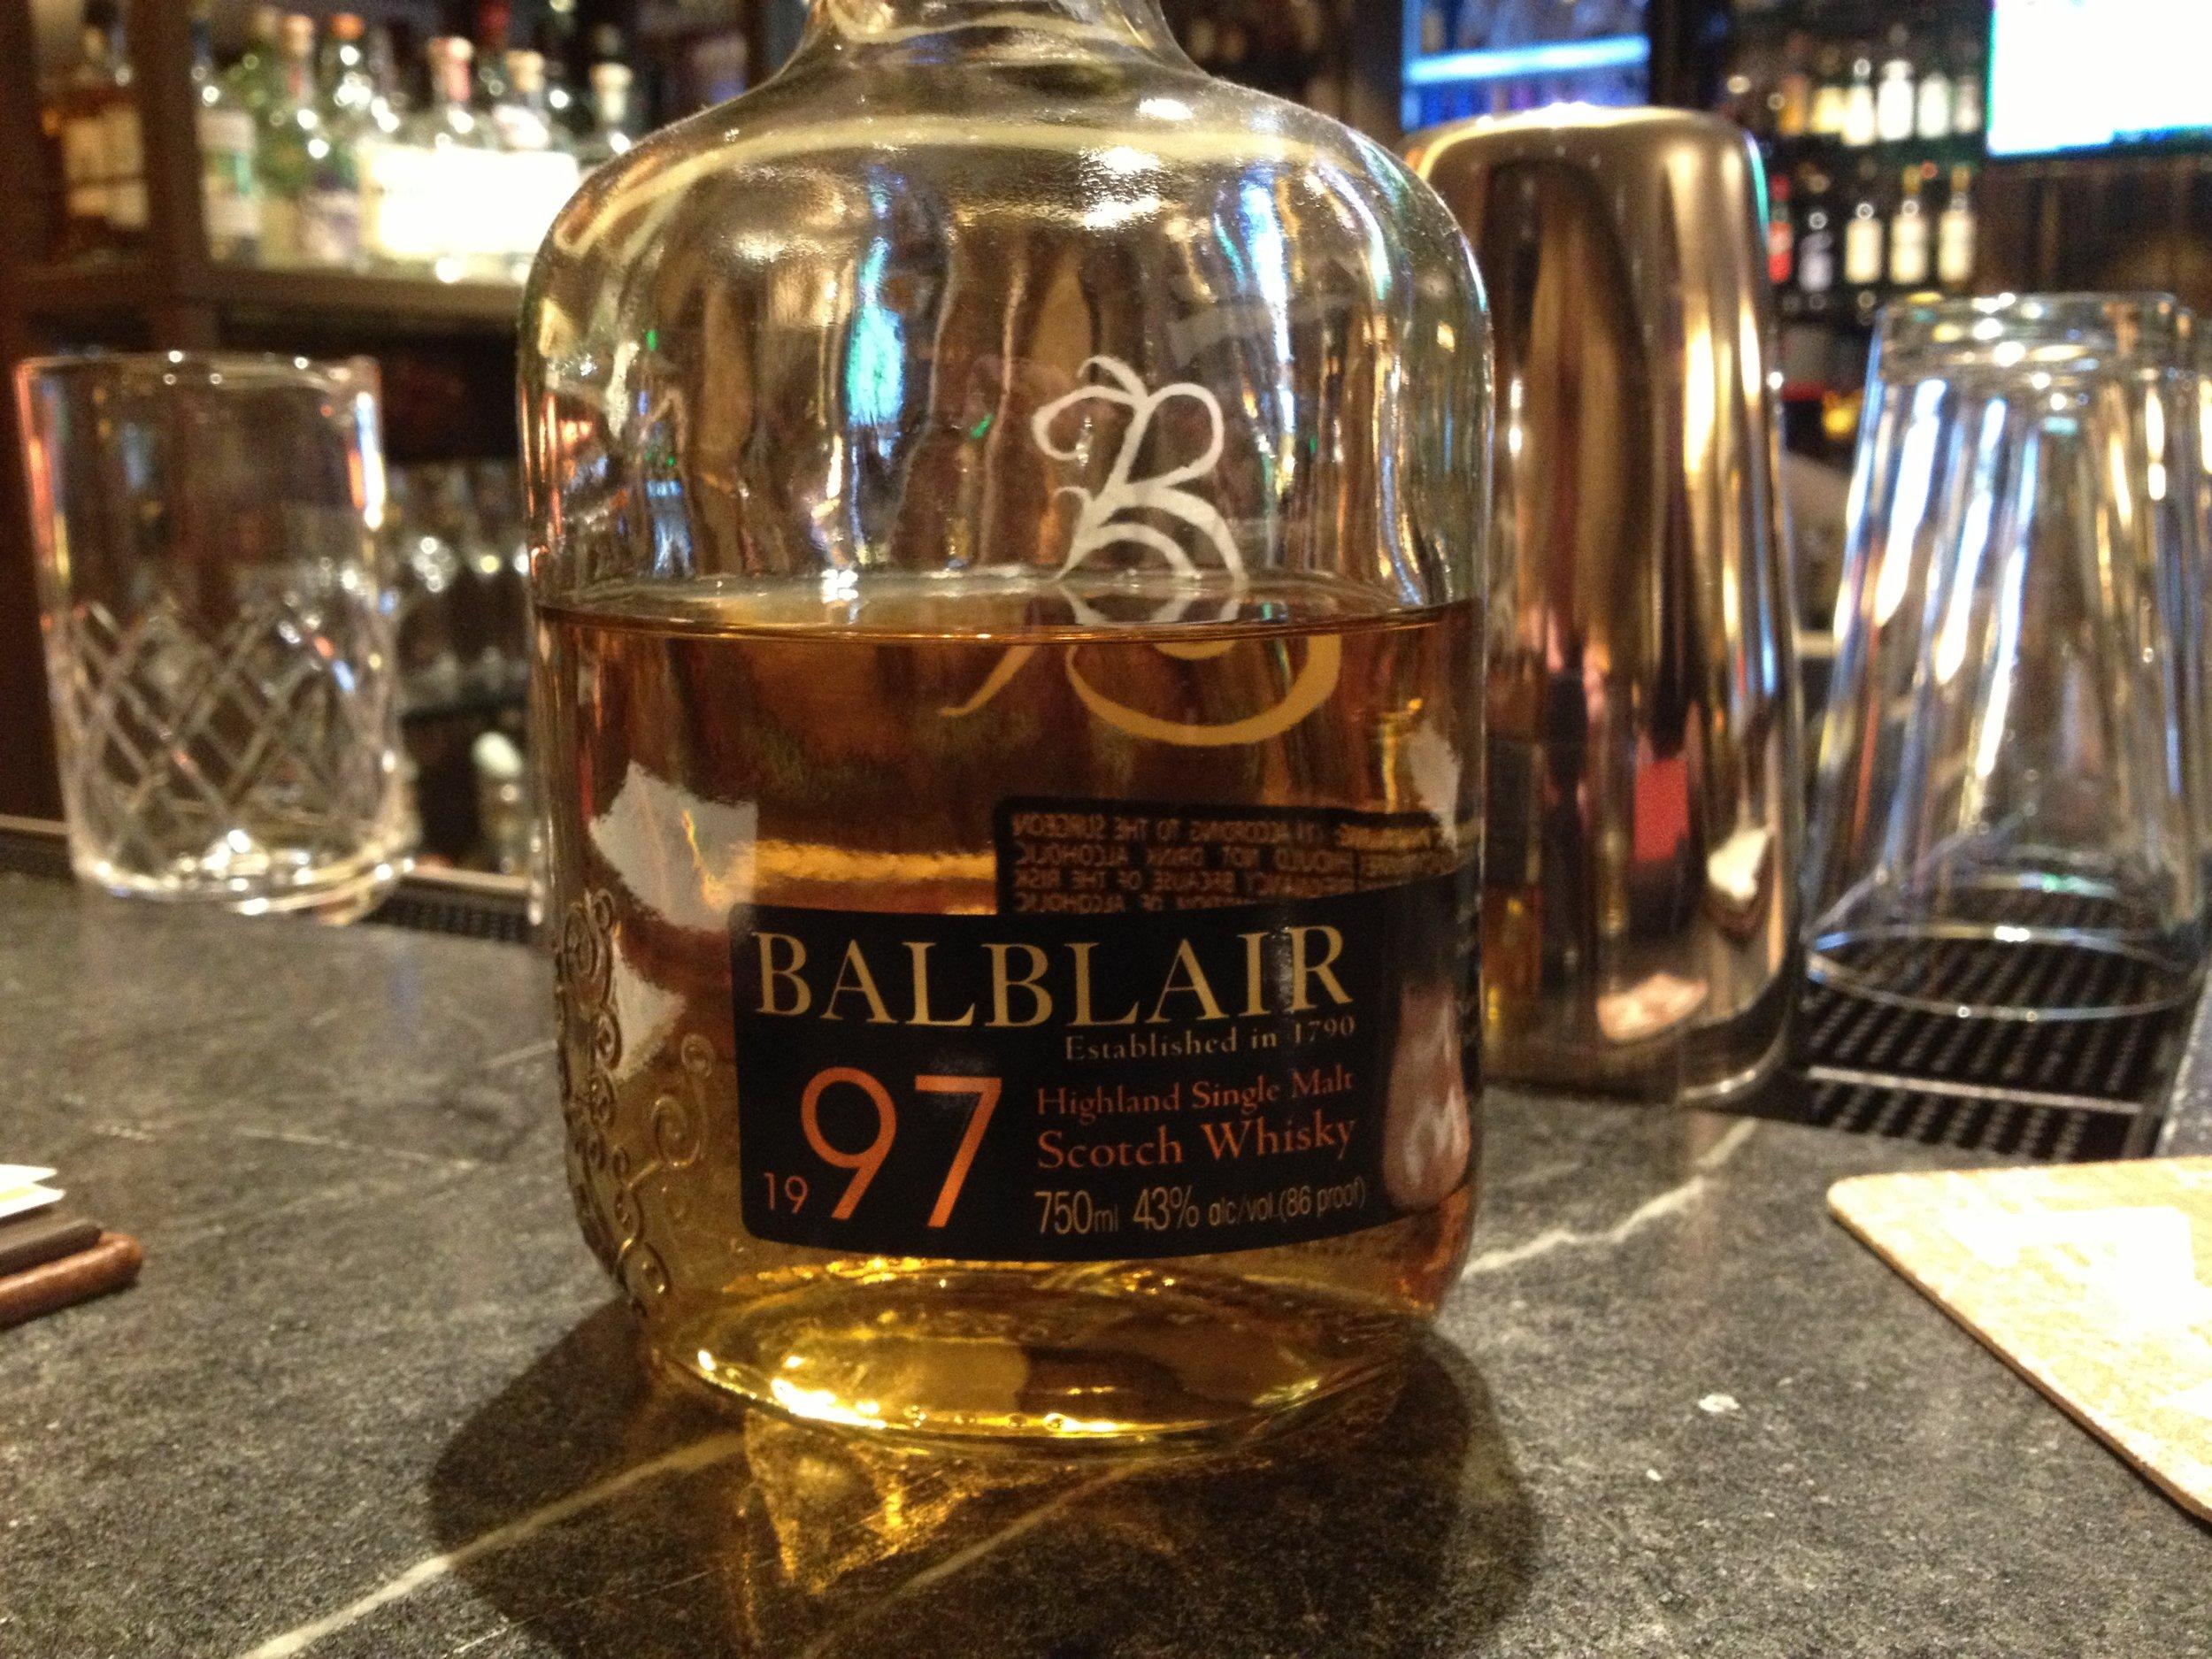 12 Year Old | 43% ABV - Distillery | Balblair